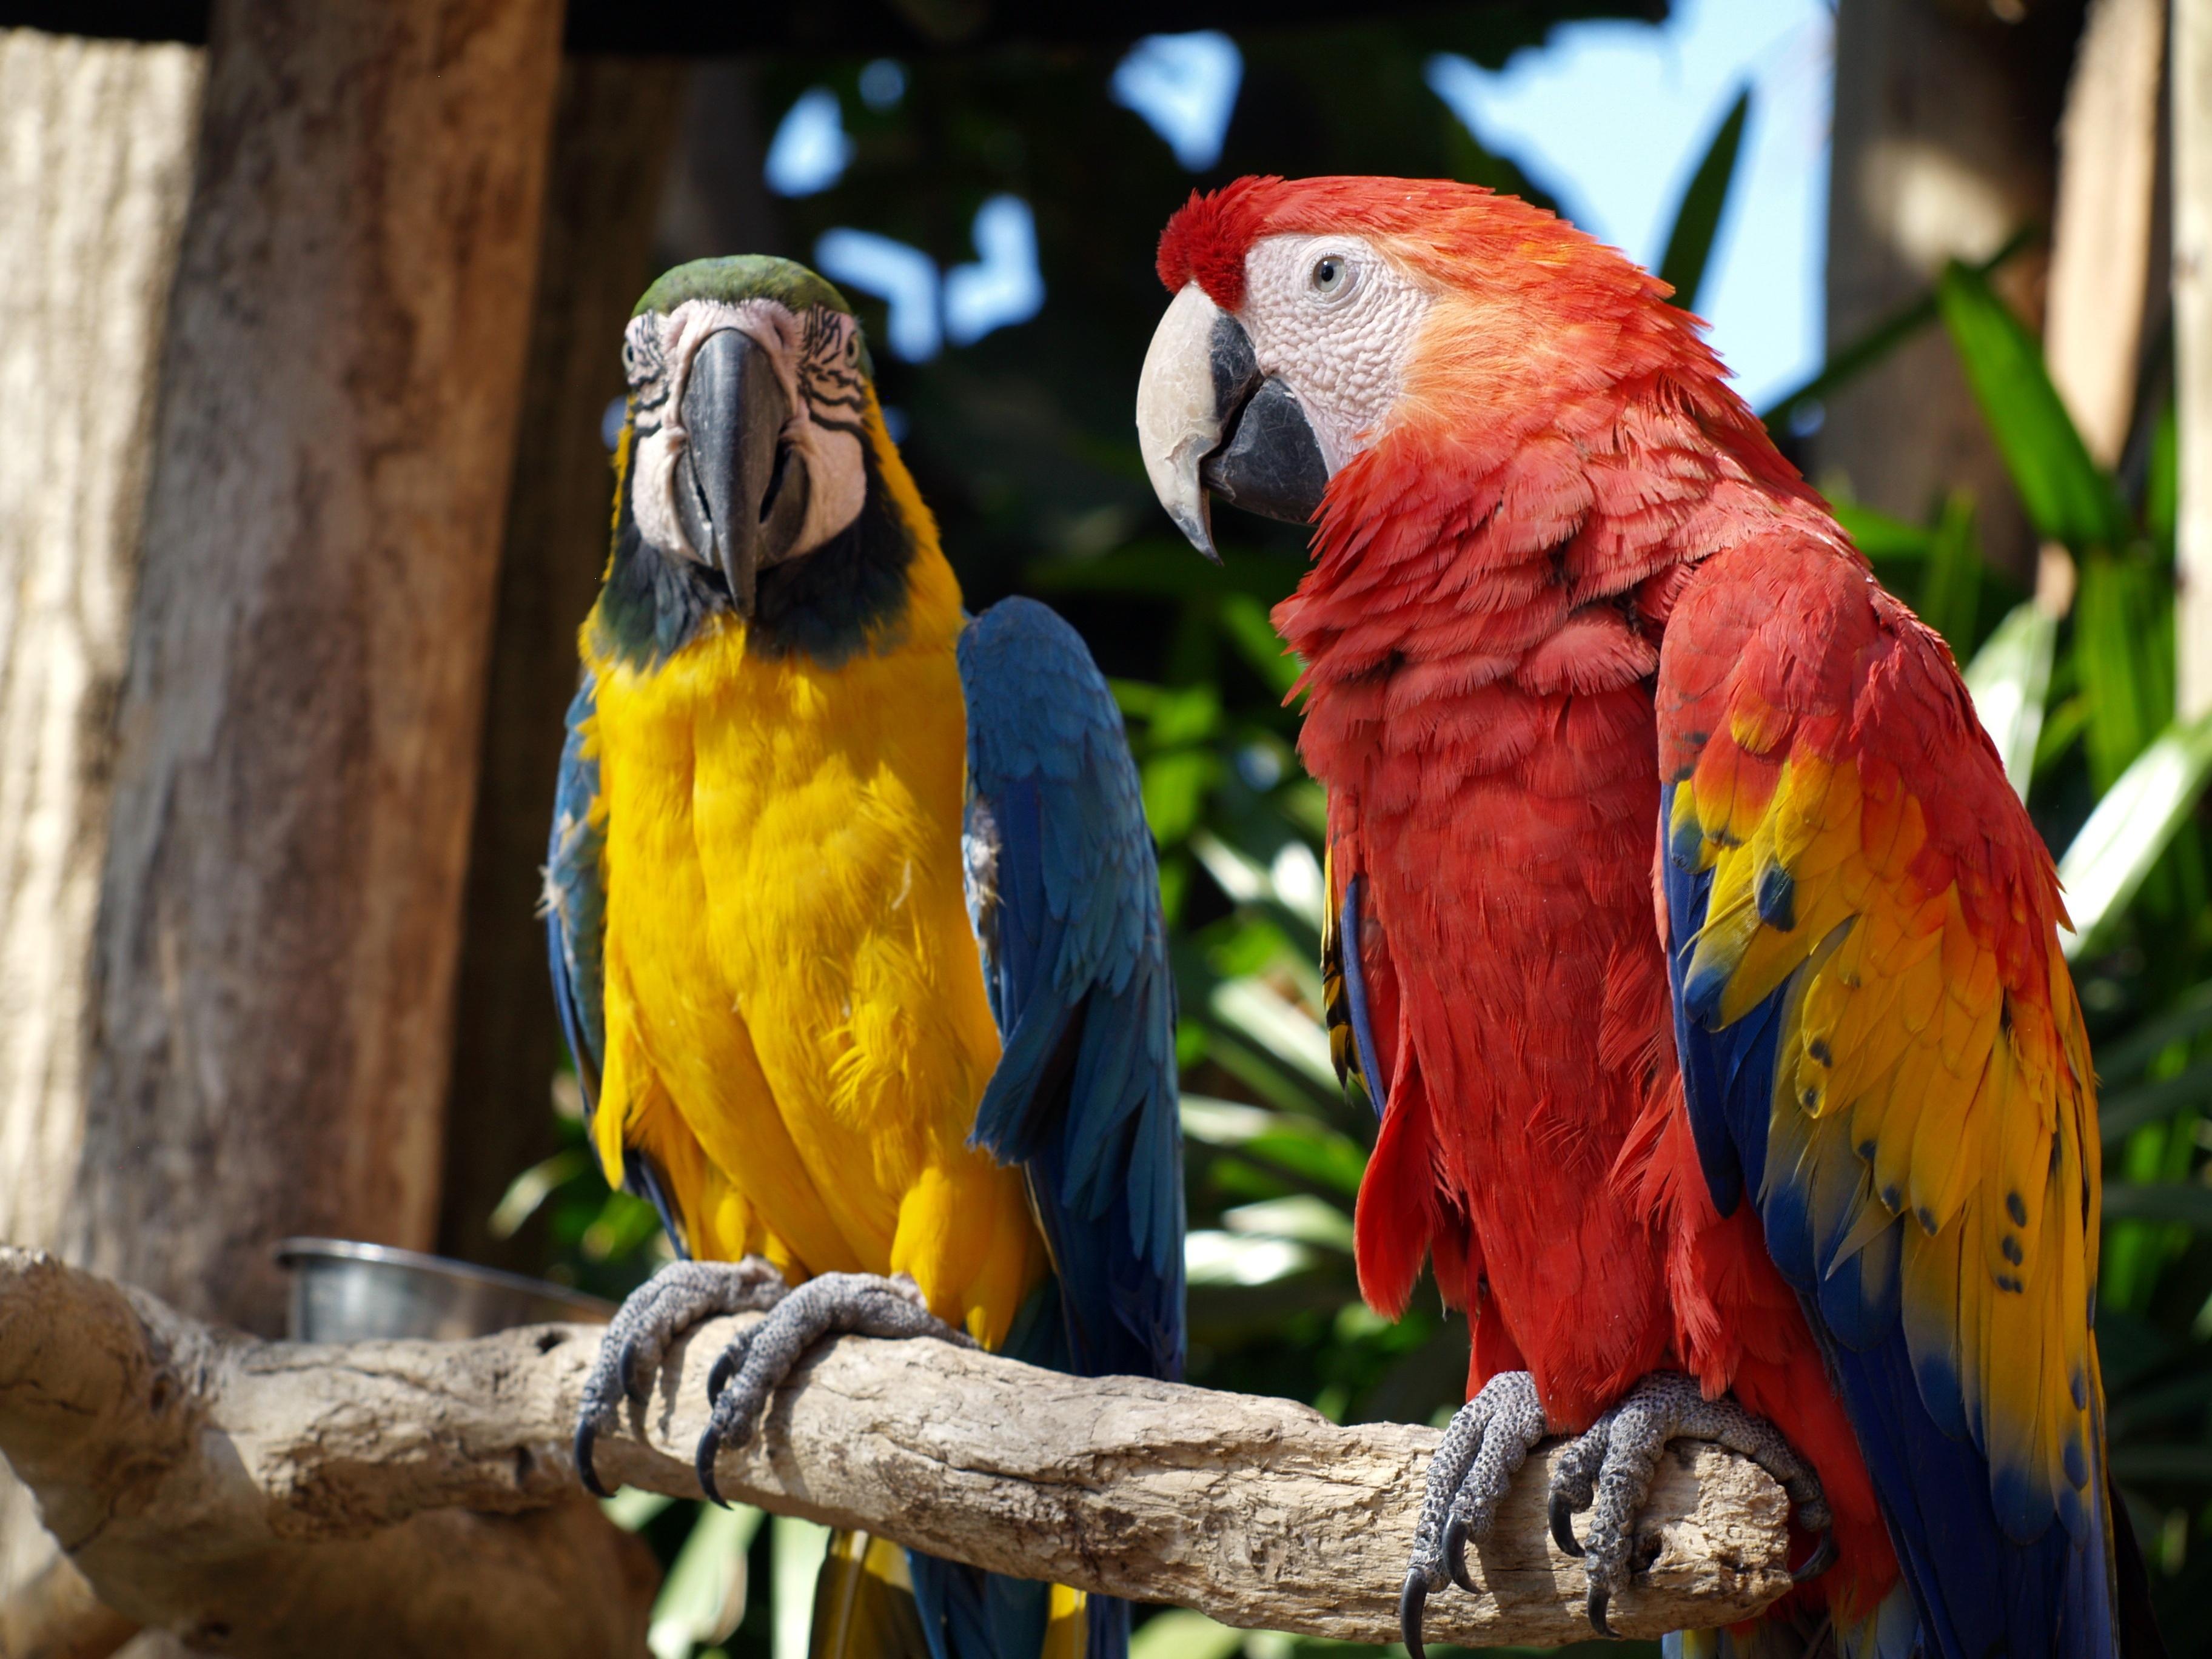 Online-Verkauf wähle echt feinste Auswahl Bildet : natur, fugl, dyreliv, nebb, fargerik, fauna ...